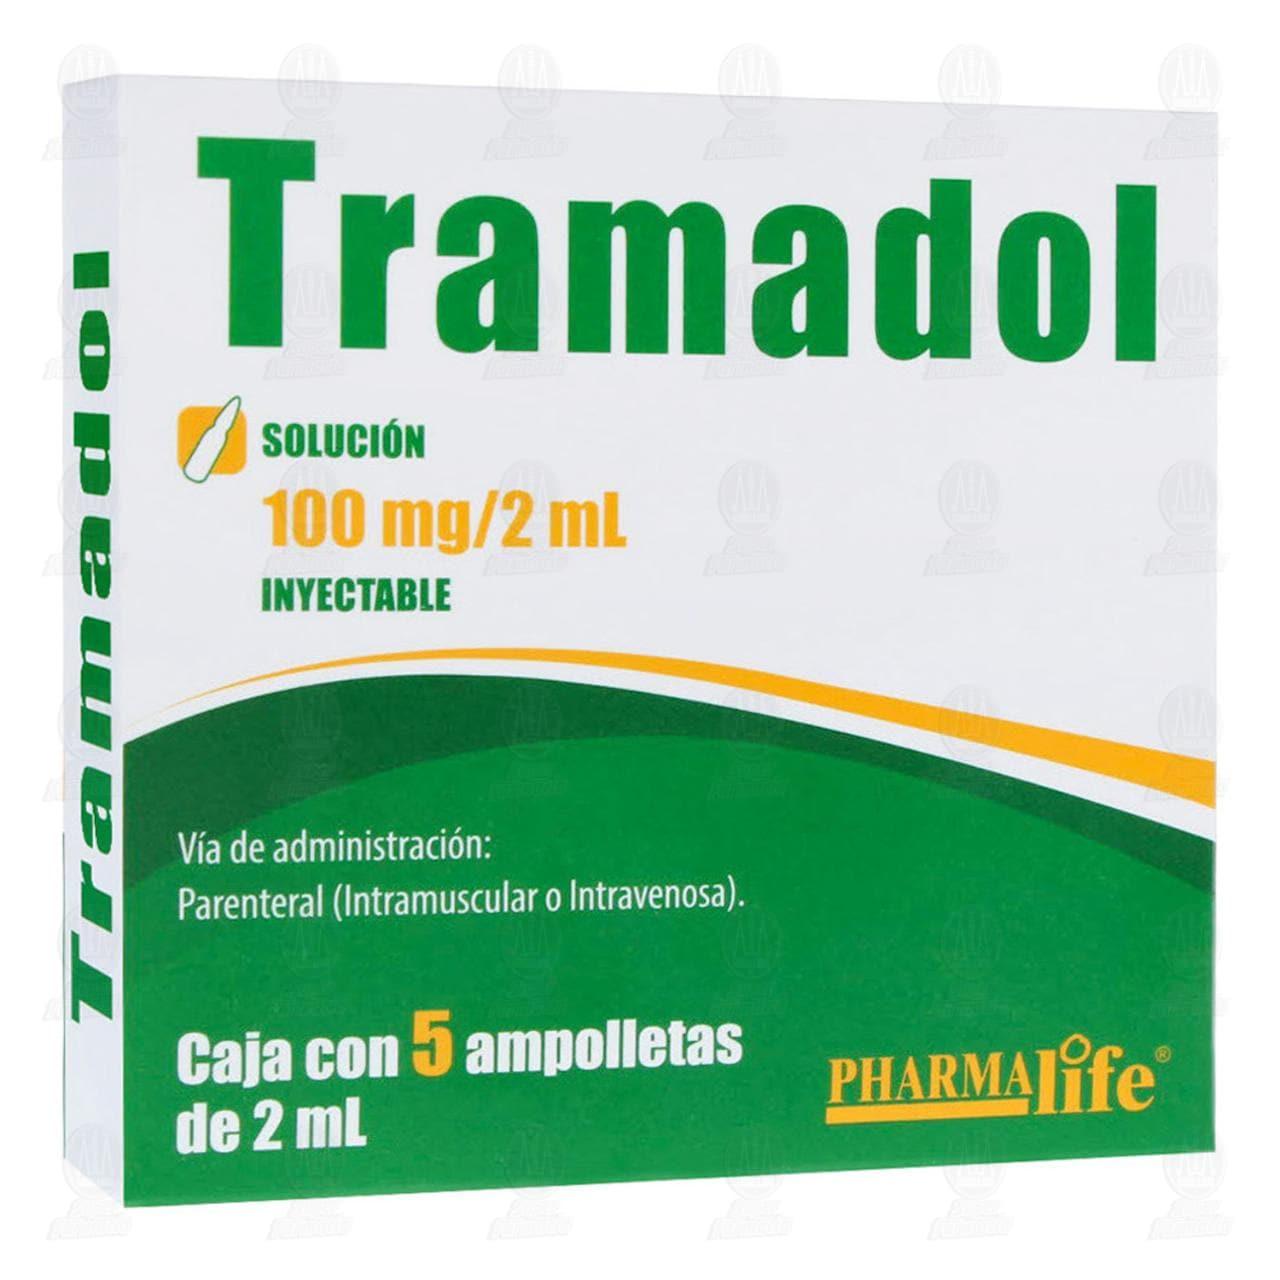 Comprar Tramadol 100mg/2ml Inyectable 5 Ampolletas Pharmalife en Farmacias Guadalajara